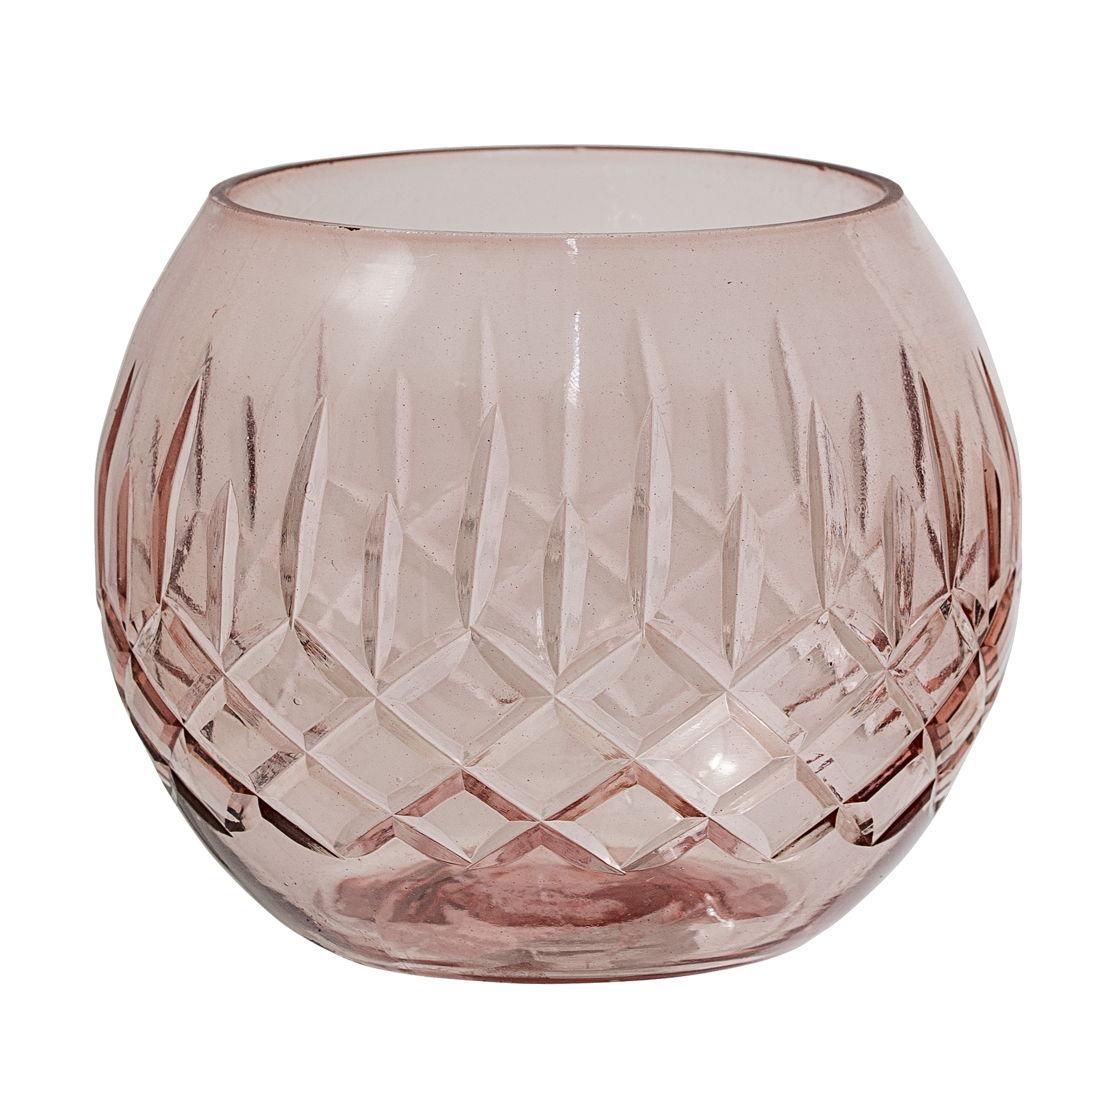 Bloomingville Waxinelichthouder glas, rose - €11